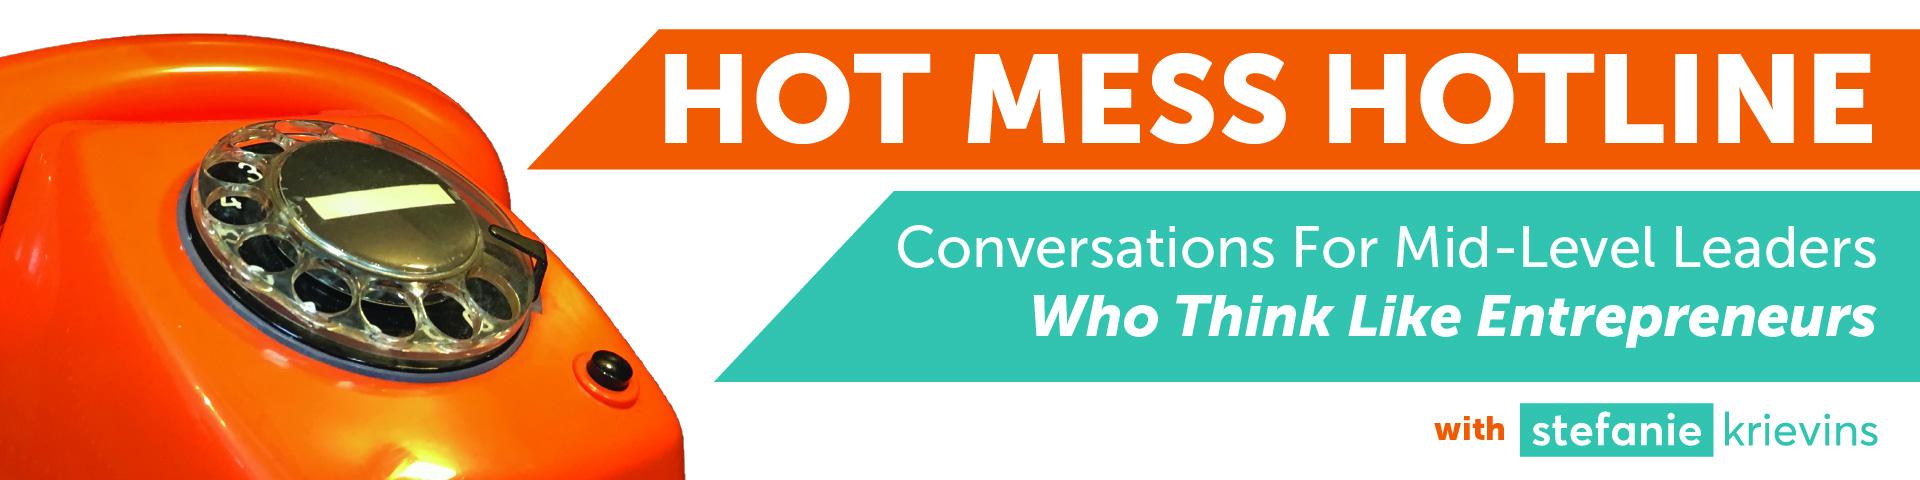 Stefanie Krievins Hot Mess Hotline Podcast orange phone